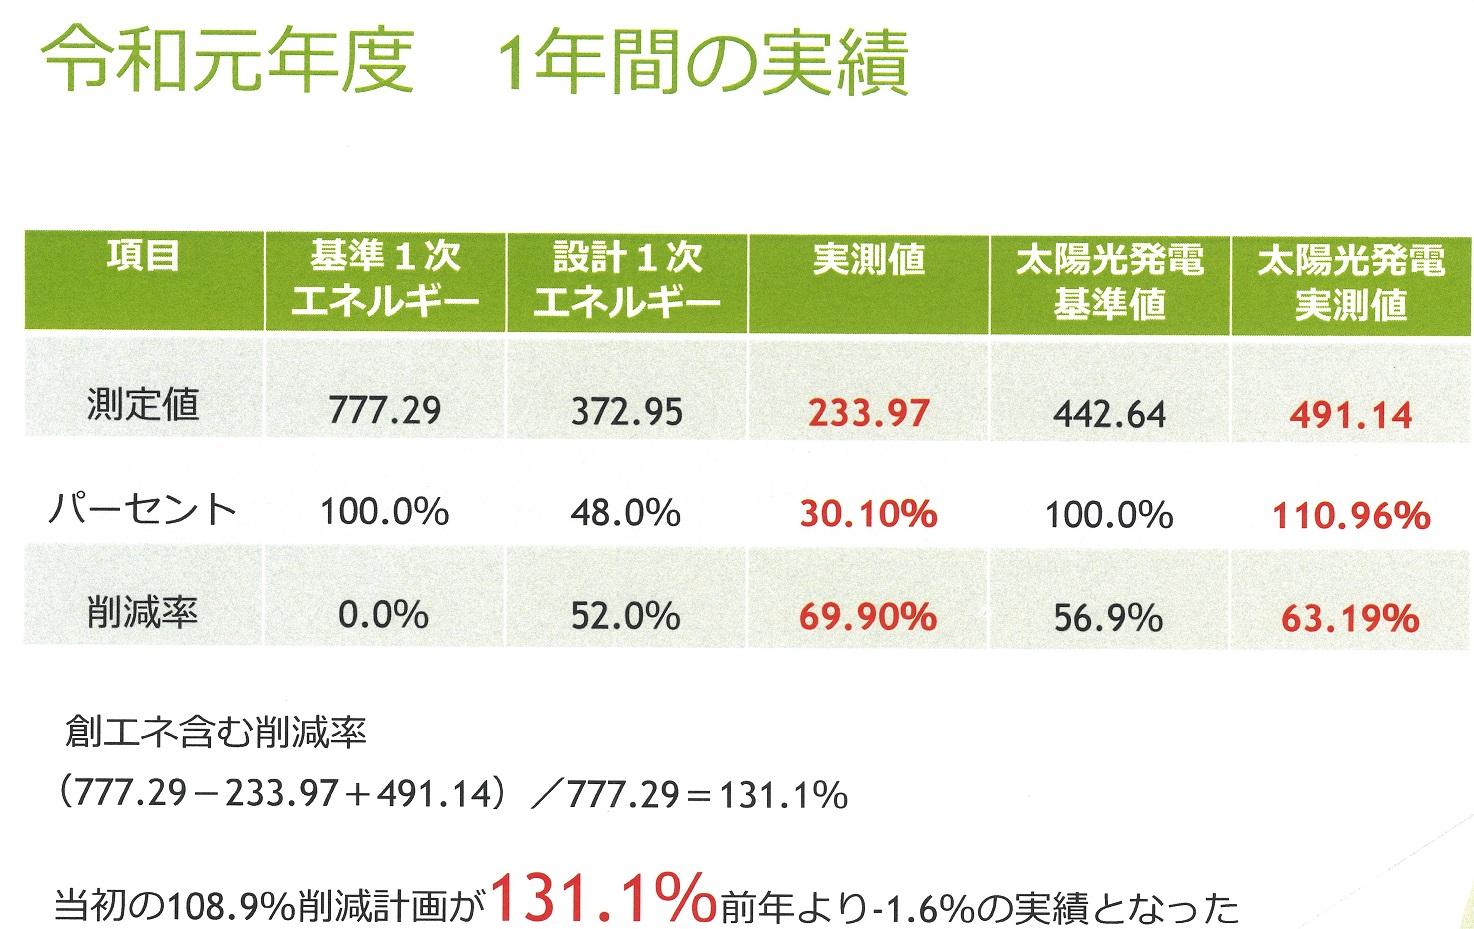 %e4%bb%a4%e5%92%8c%e5%85%83%e5%b9%b4%e5%ba%a6zeb%e5%ae%9f%e7%b8%be